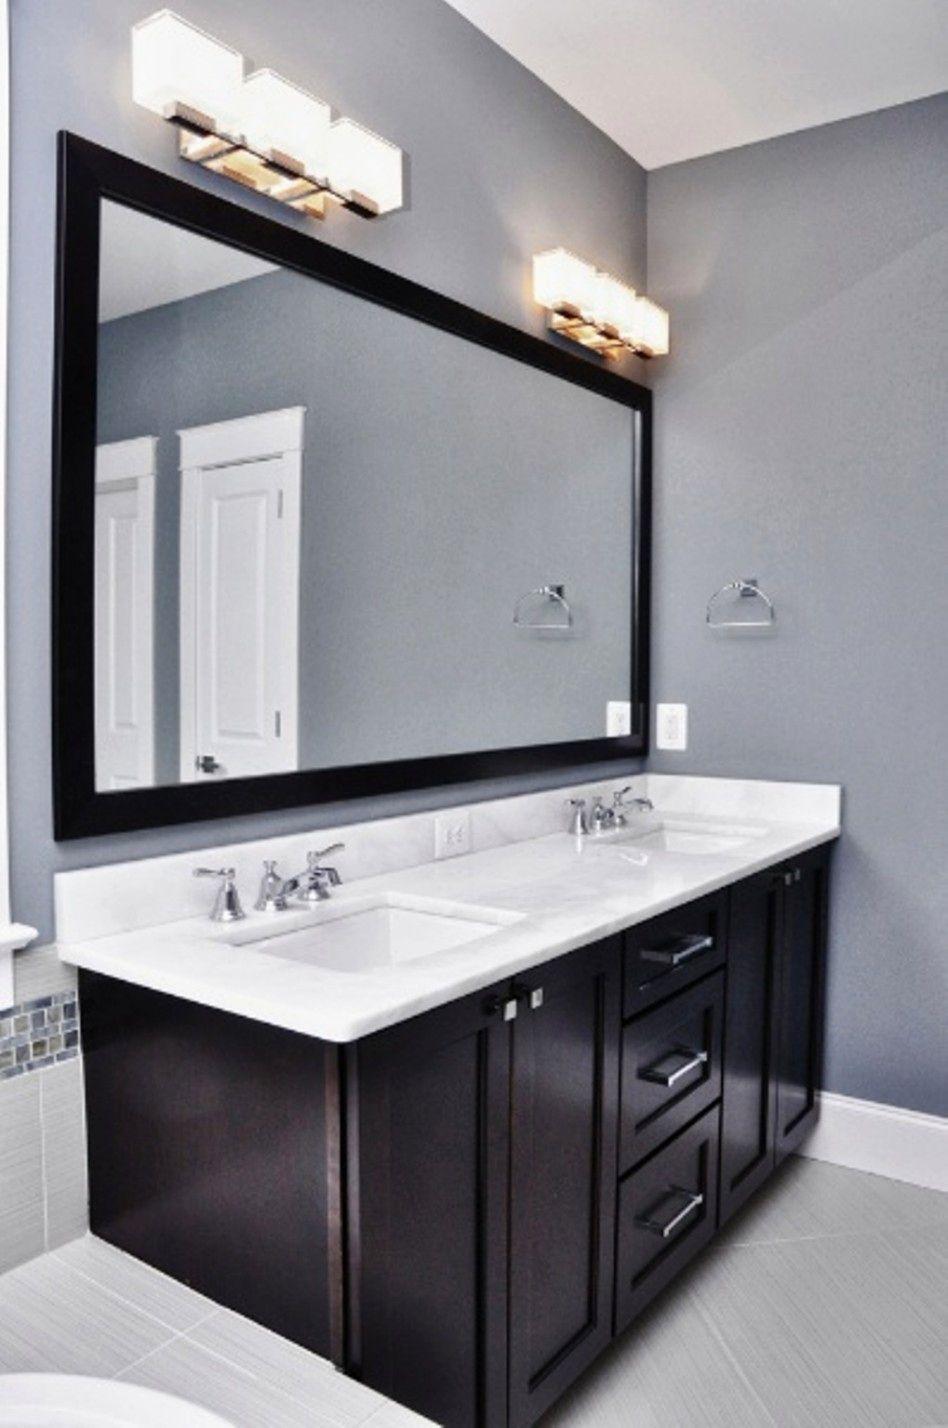 fascinating bathroom wall tile ideas photo-Amazing Bathroom Wall Tile Ideas Architecture